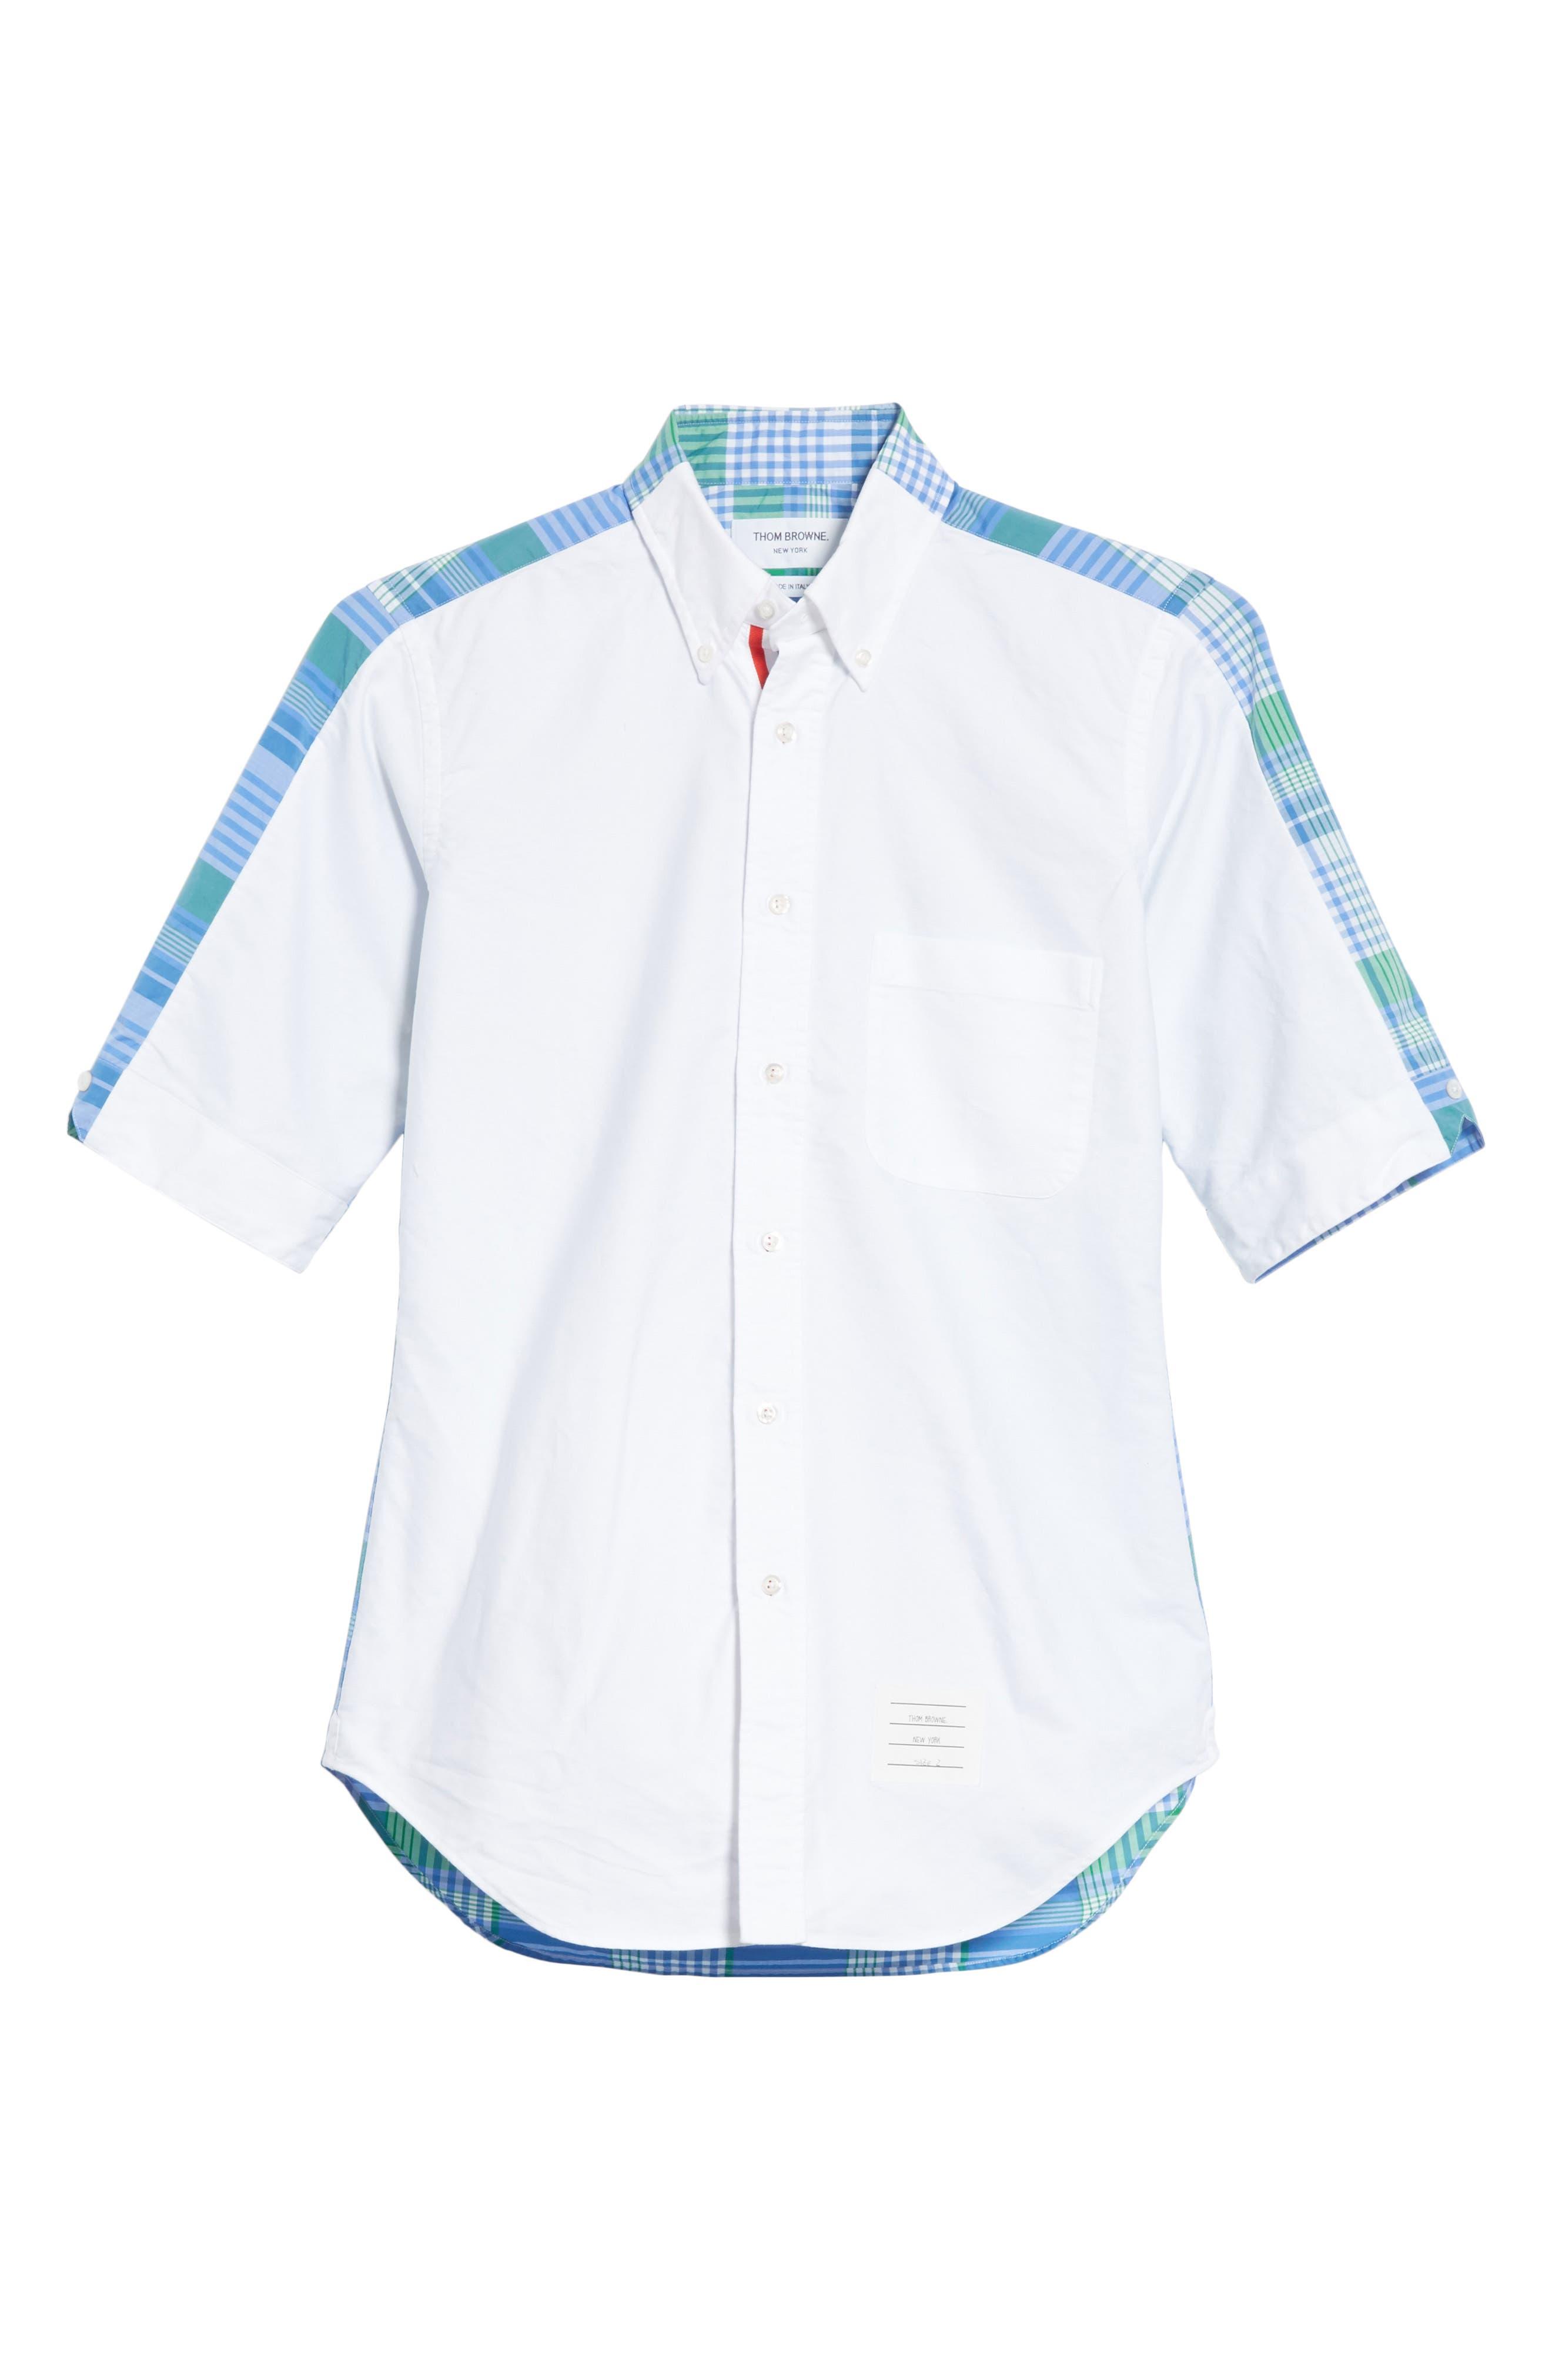 Solid & Plaid Woven Shirt,                             Alternate thumbnail 6, color,                             470